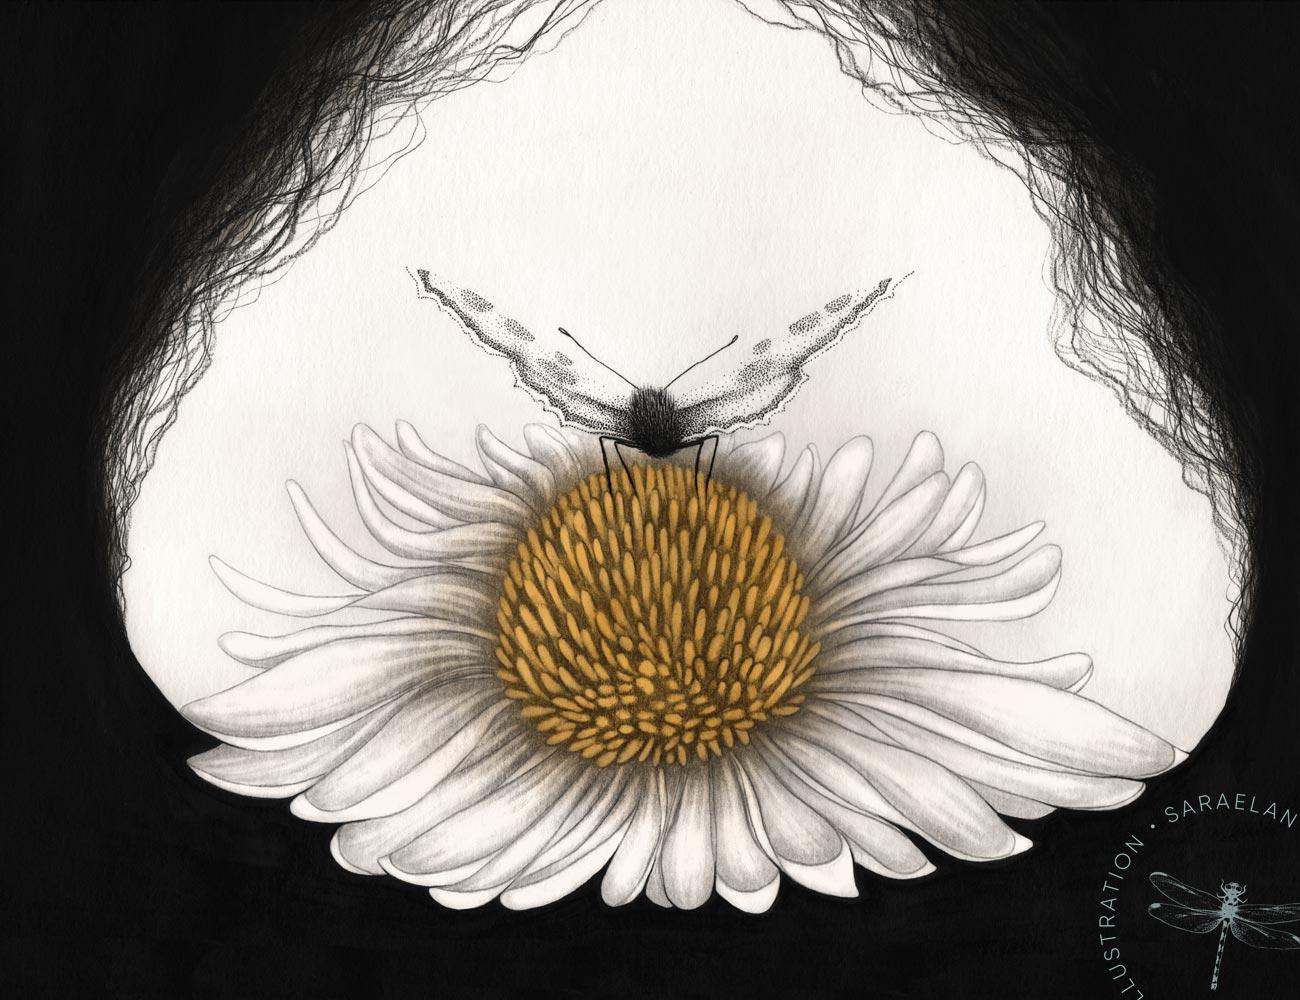 Equilibrium di Sara Elan Donati - disegni di farfalle in equilibrio in inchiostro e dotwork